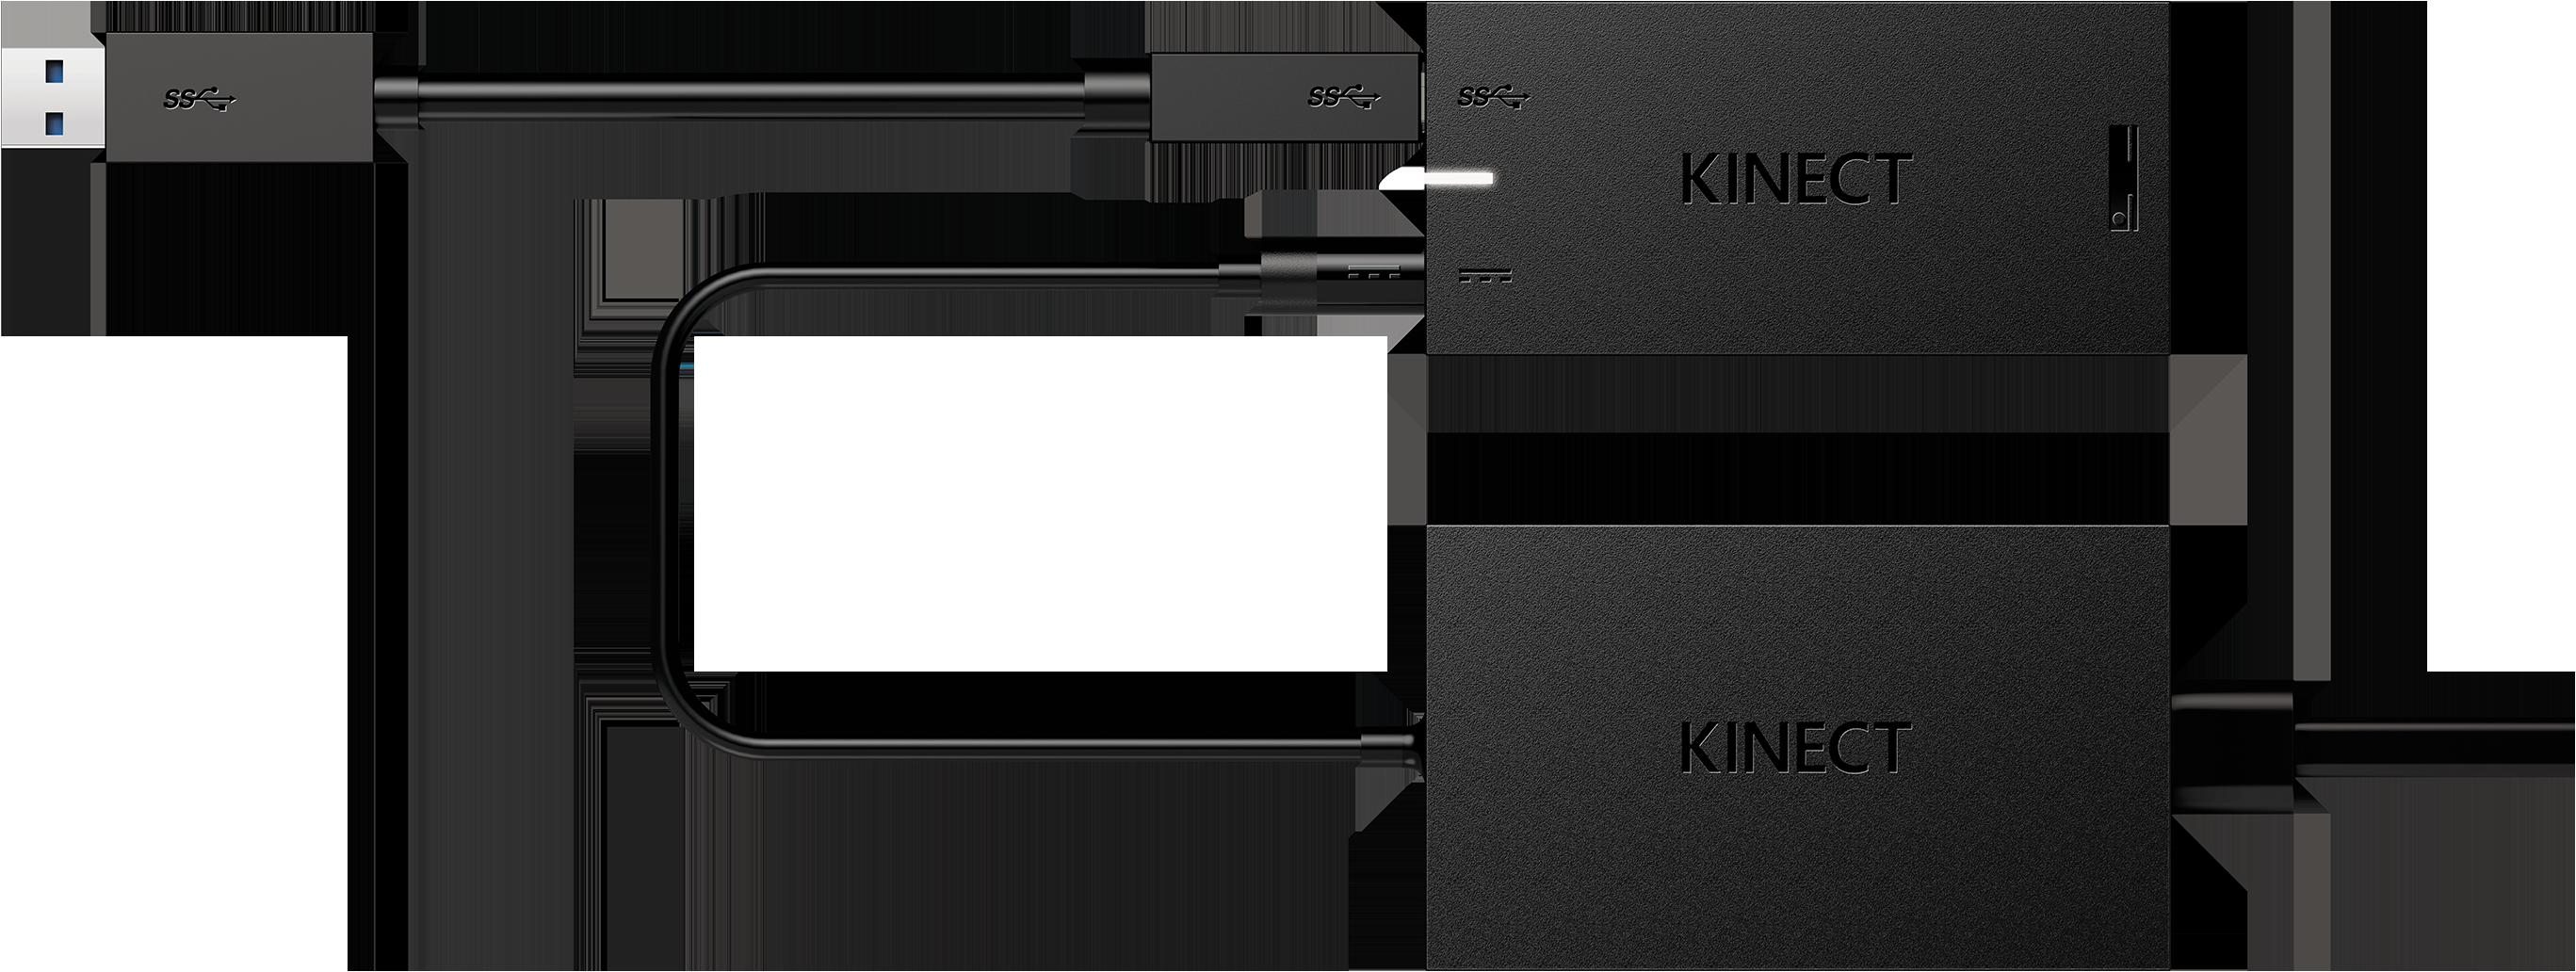 Xbox One Kinect センサー アダプター